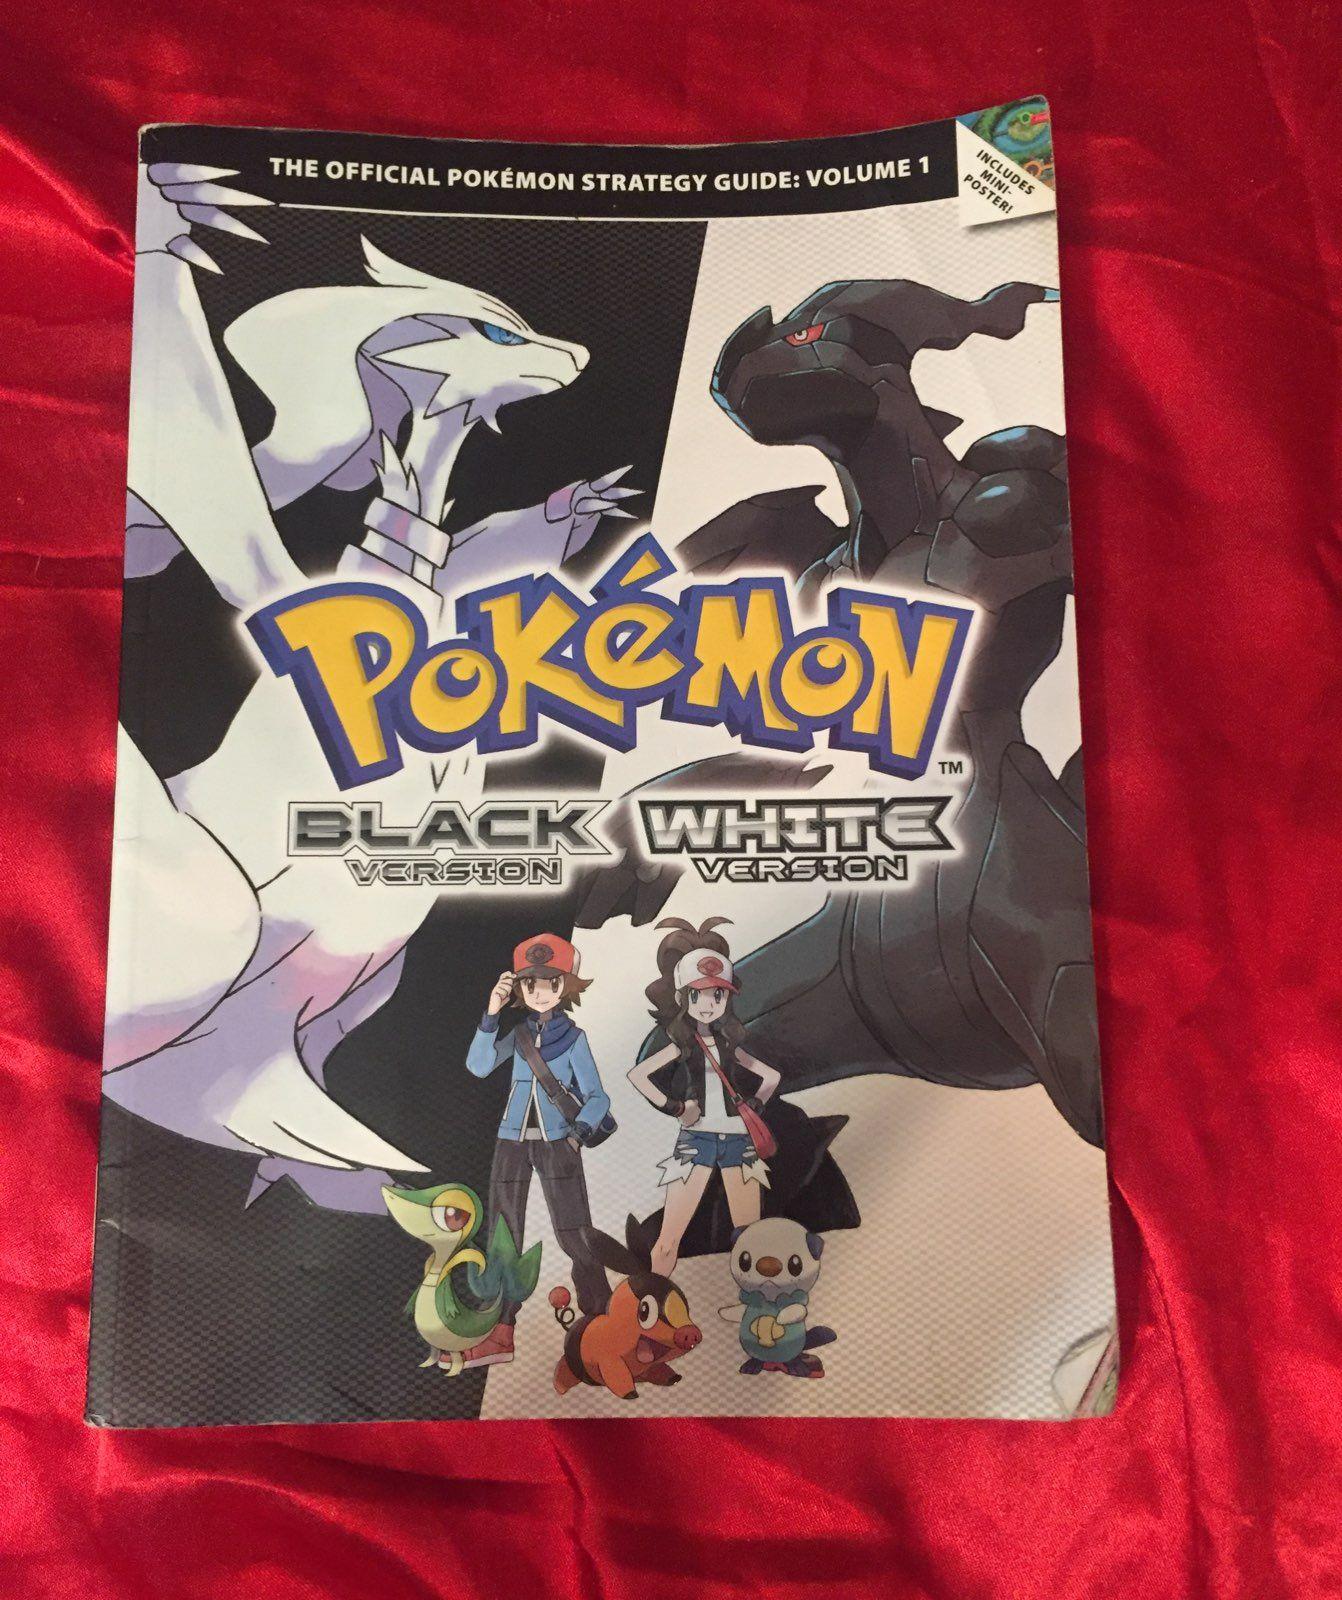 Pokemon Black & White Version Guide Mercari BUY & SELL